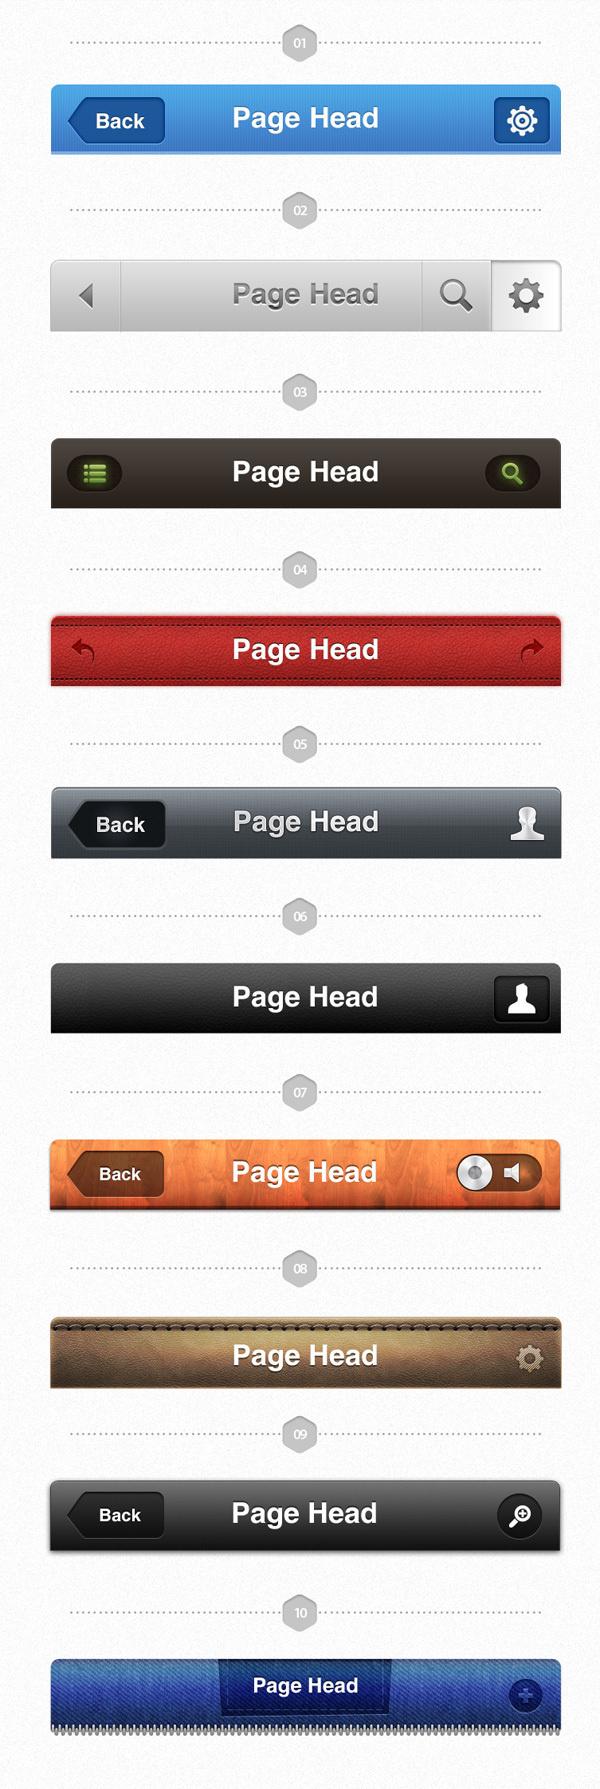 UI Pack for iOS – Build Apps. Awesomely! #header #app #ios #navbar #navigation